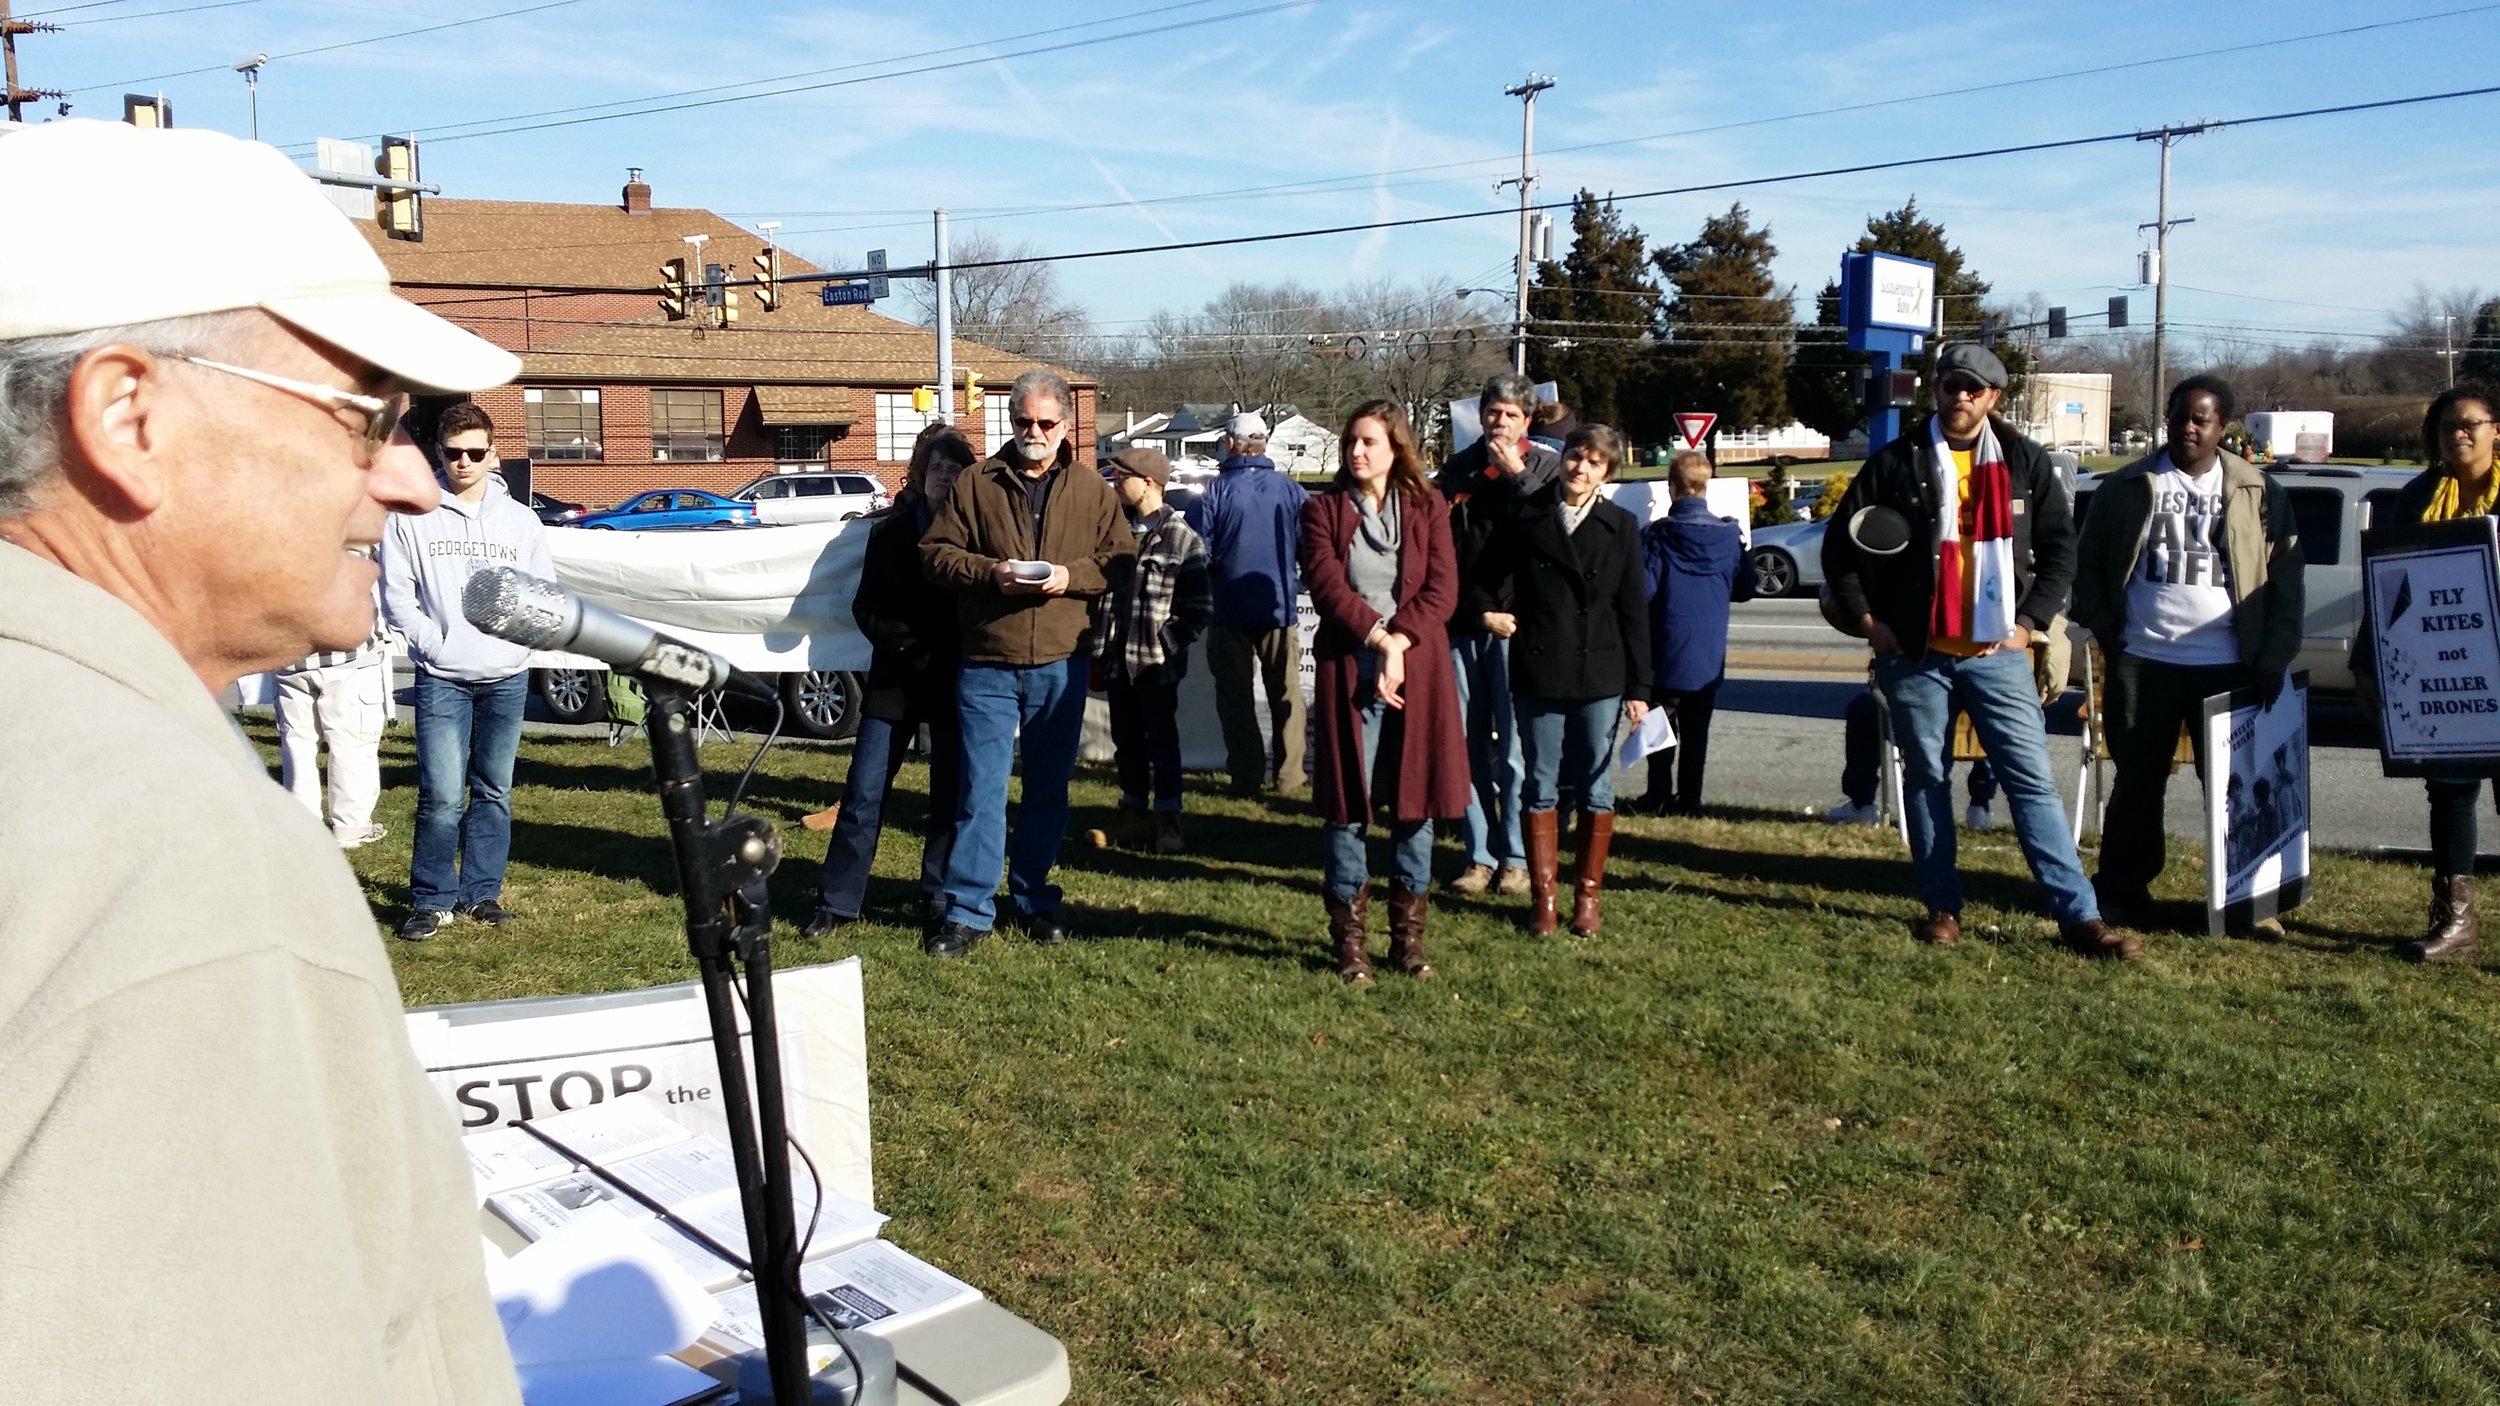 In Dec of 2014, 21 Pilgrims attended the vigil at Horsham. Additonal photos below.